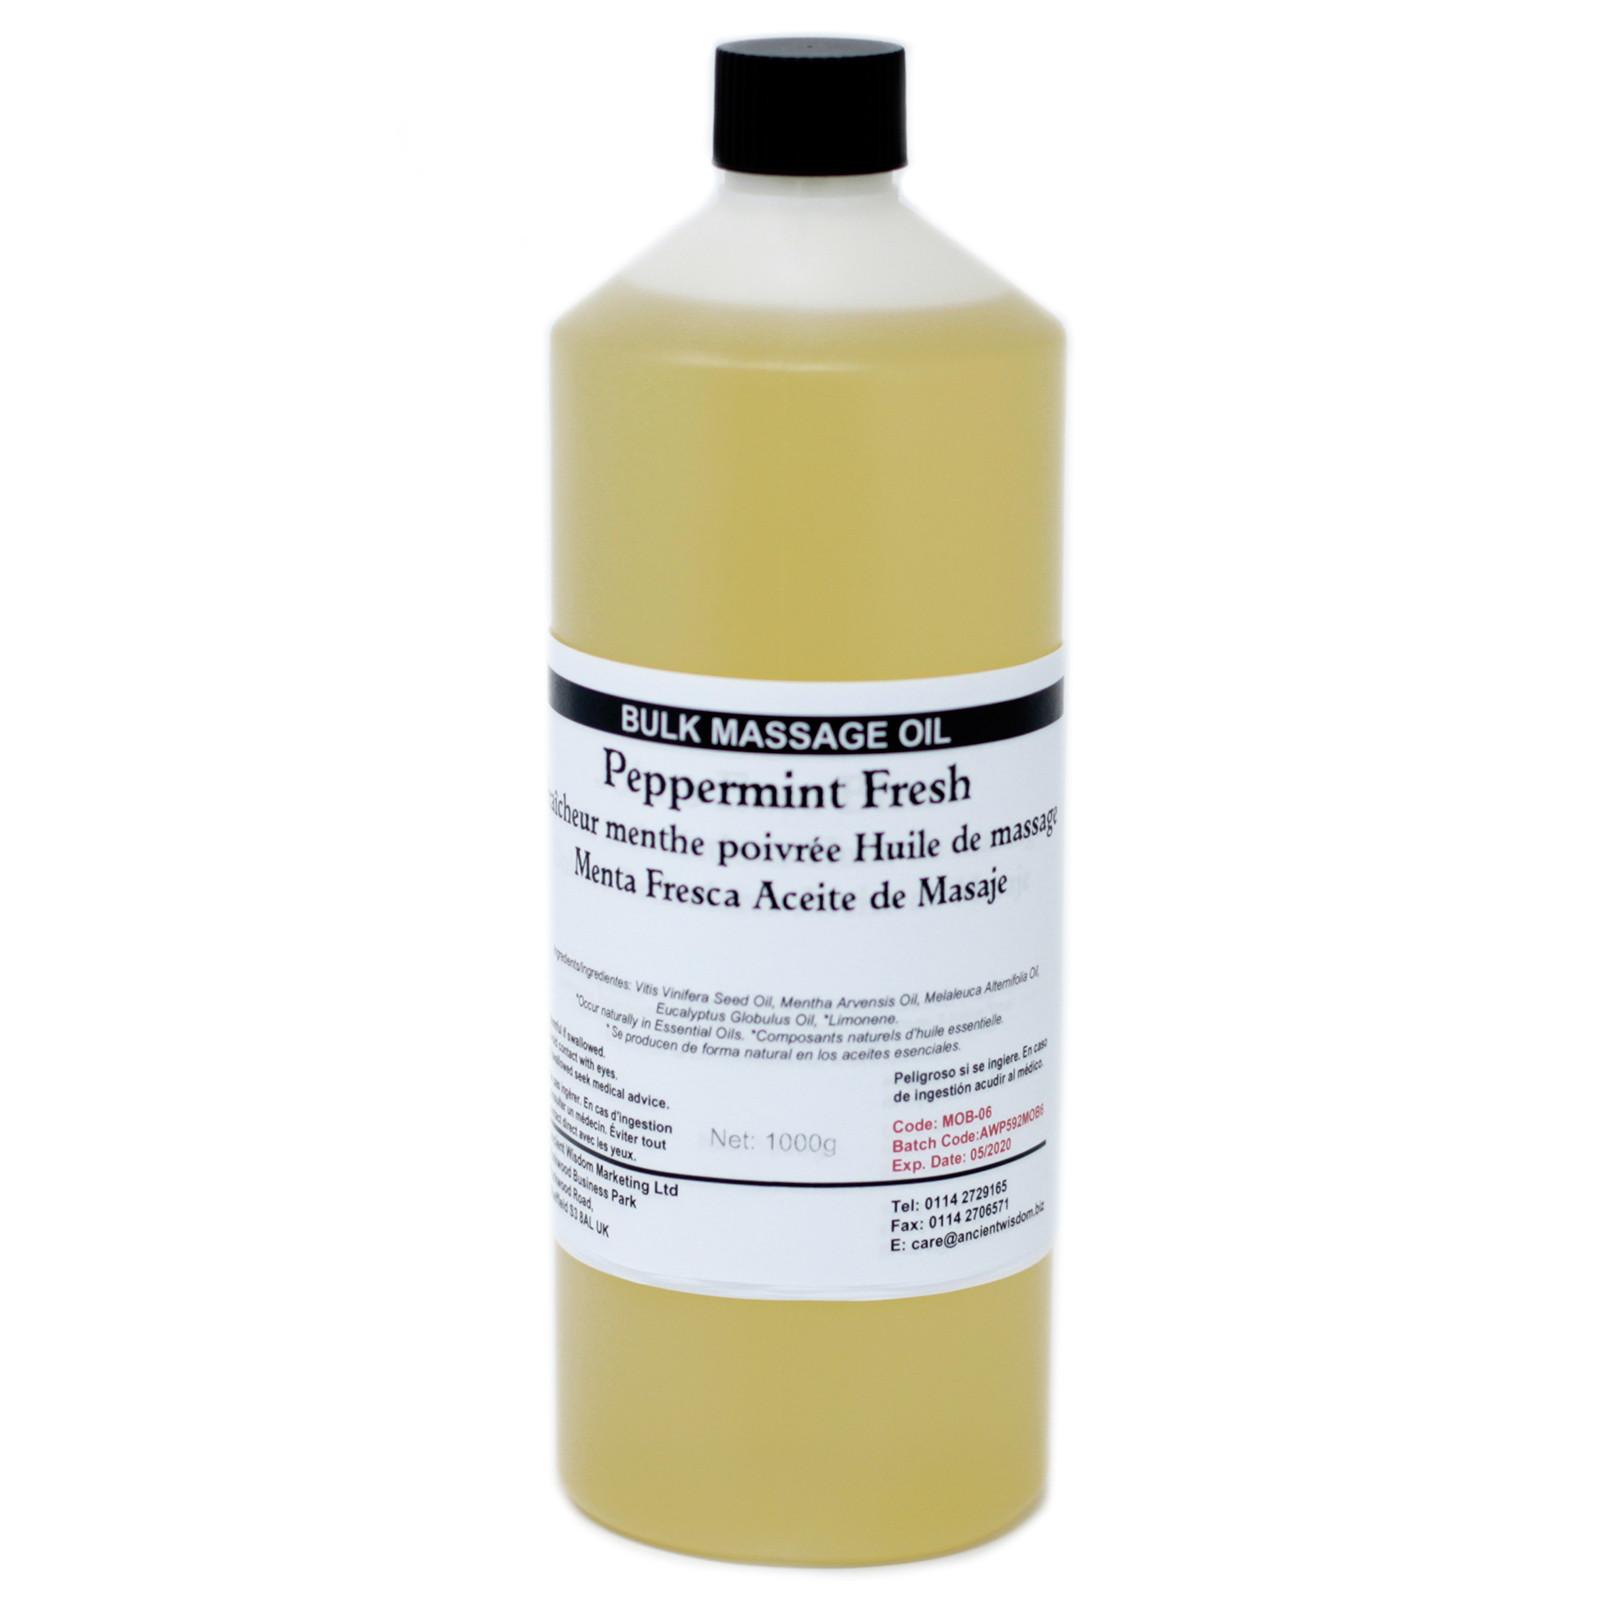 Peppermint Fresh 1Kg Massage Oil